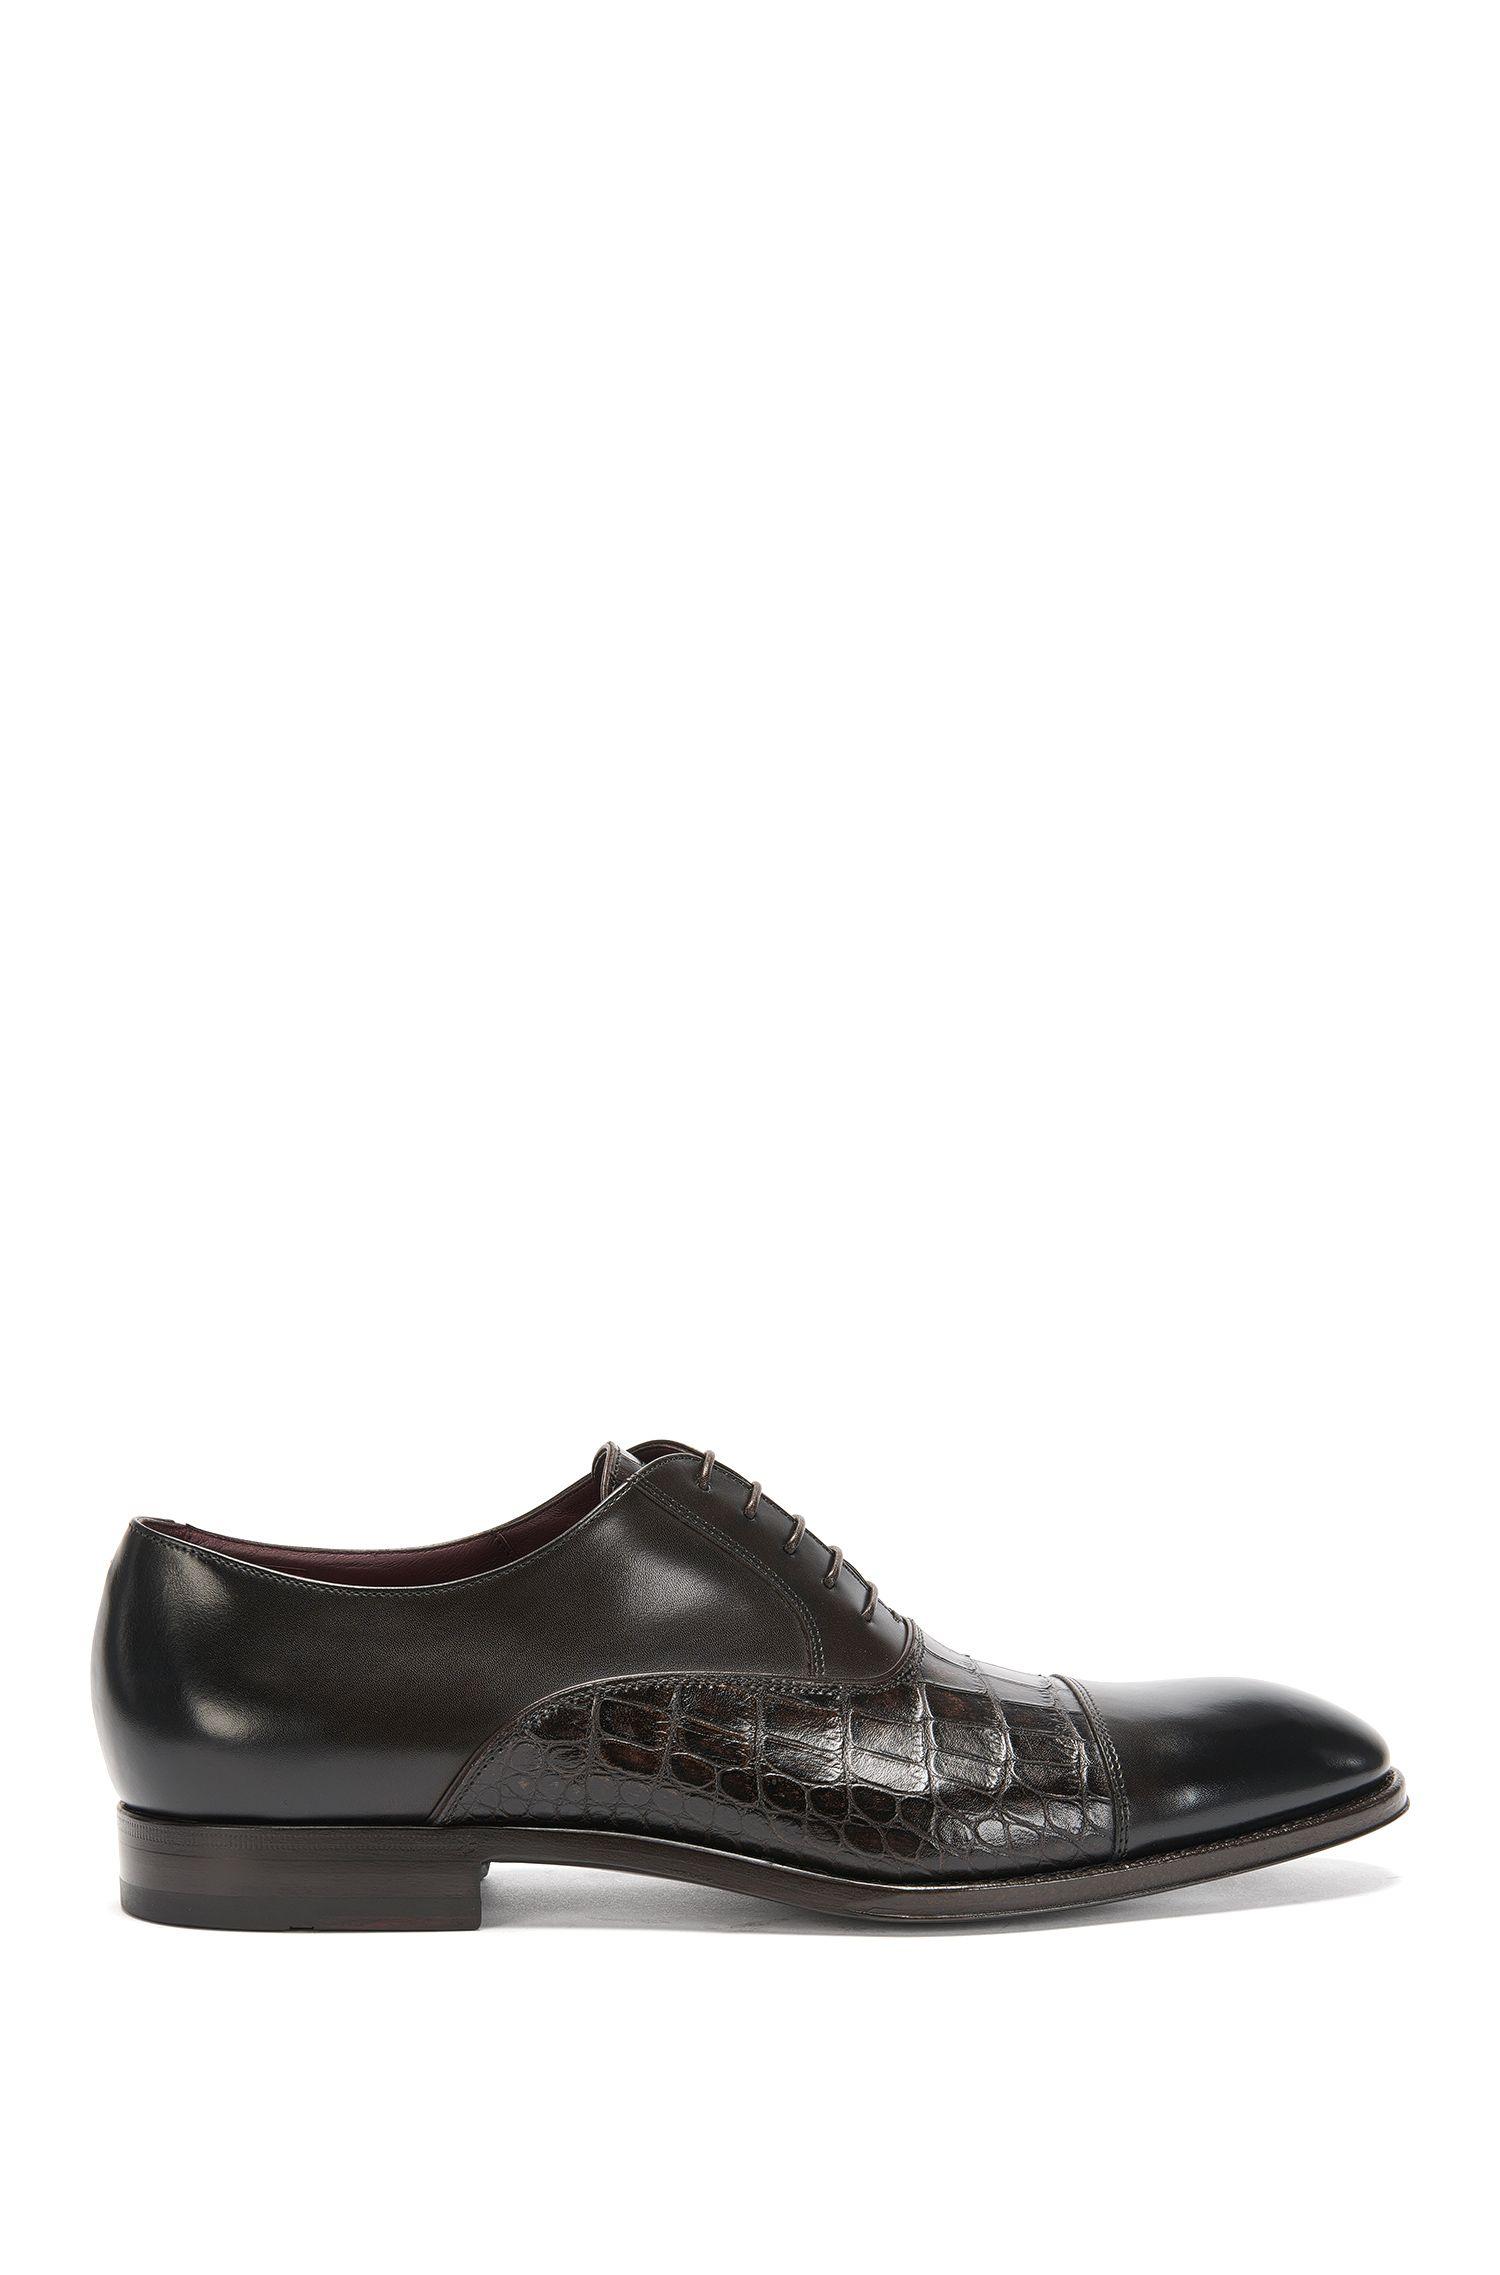 Embossed Leather Oxford Dress Shoe | T-Legend Oxfr Exct, Dark Brown